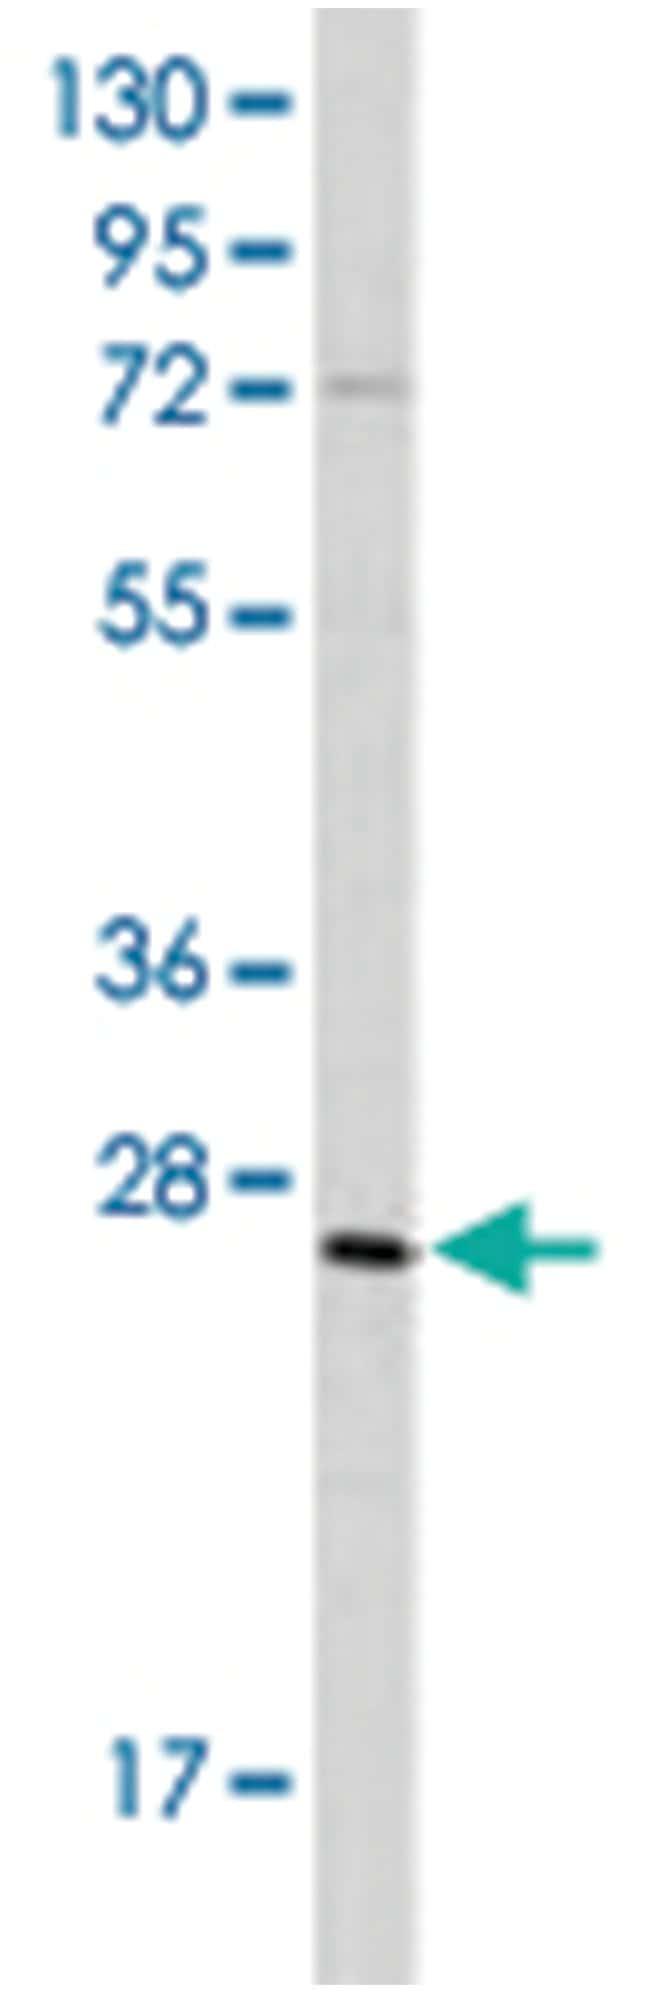 GREM1 (C-terminus), Rabbit, Polyclonal Antibody, Abnova 400µL; Unlabeled